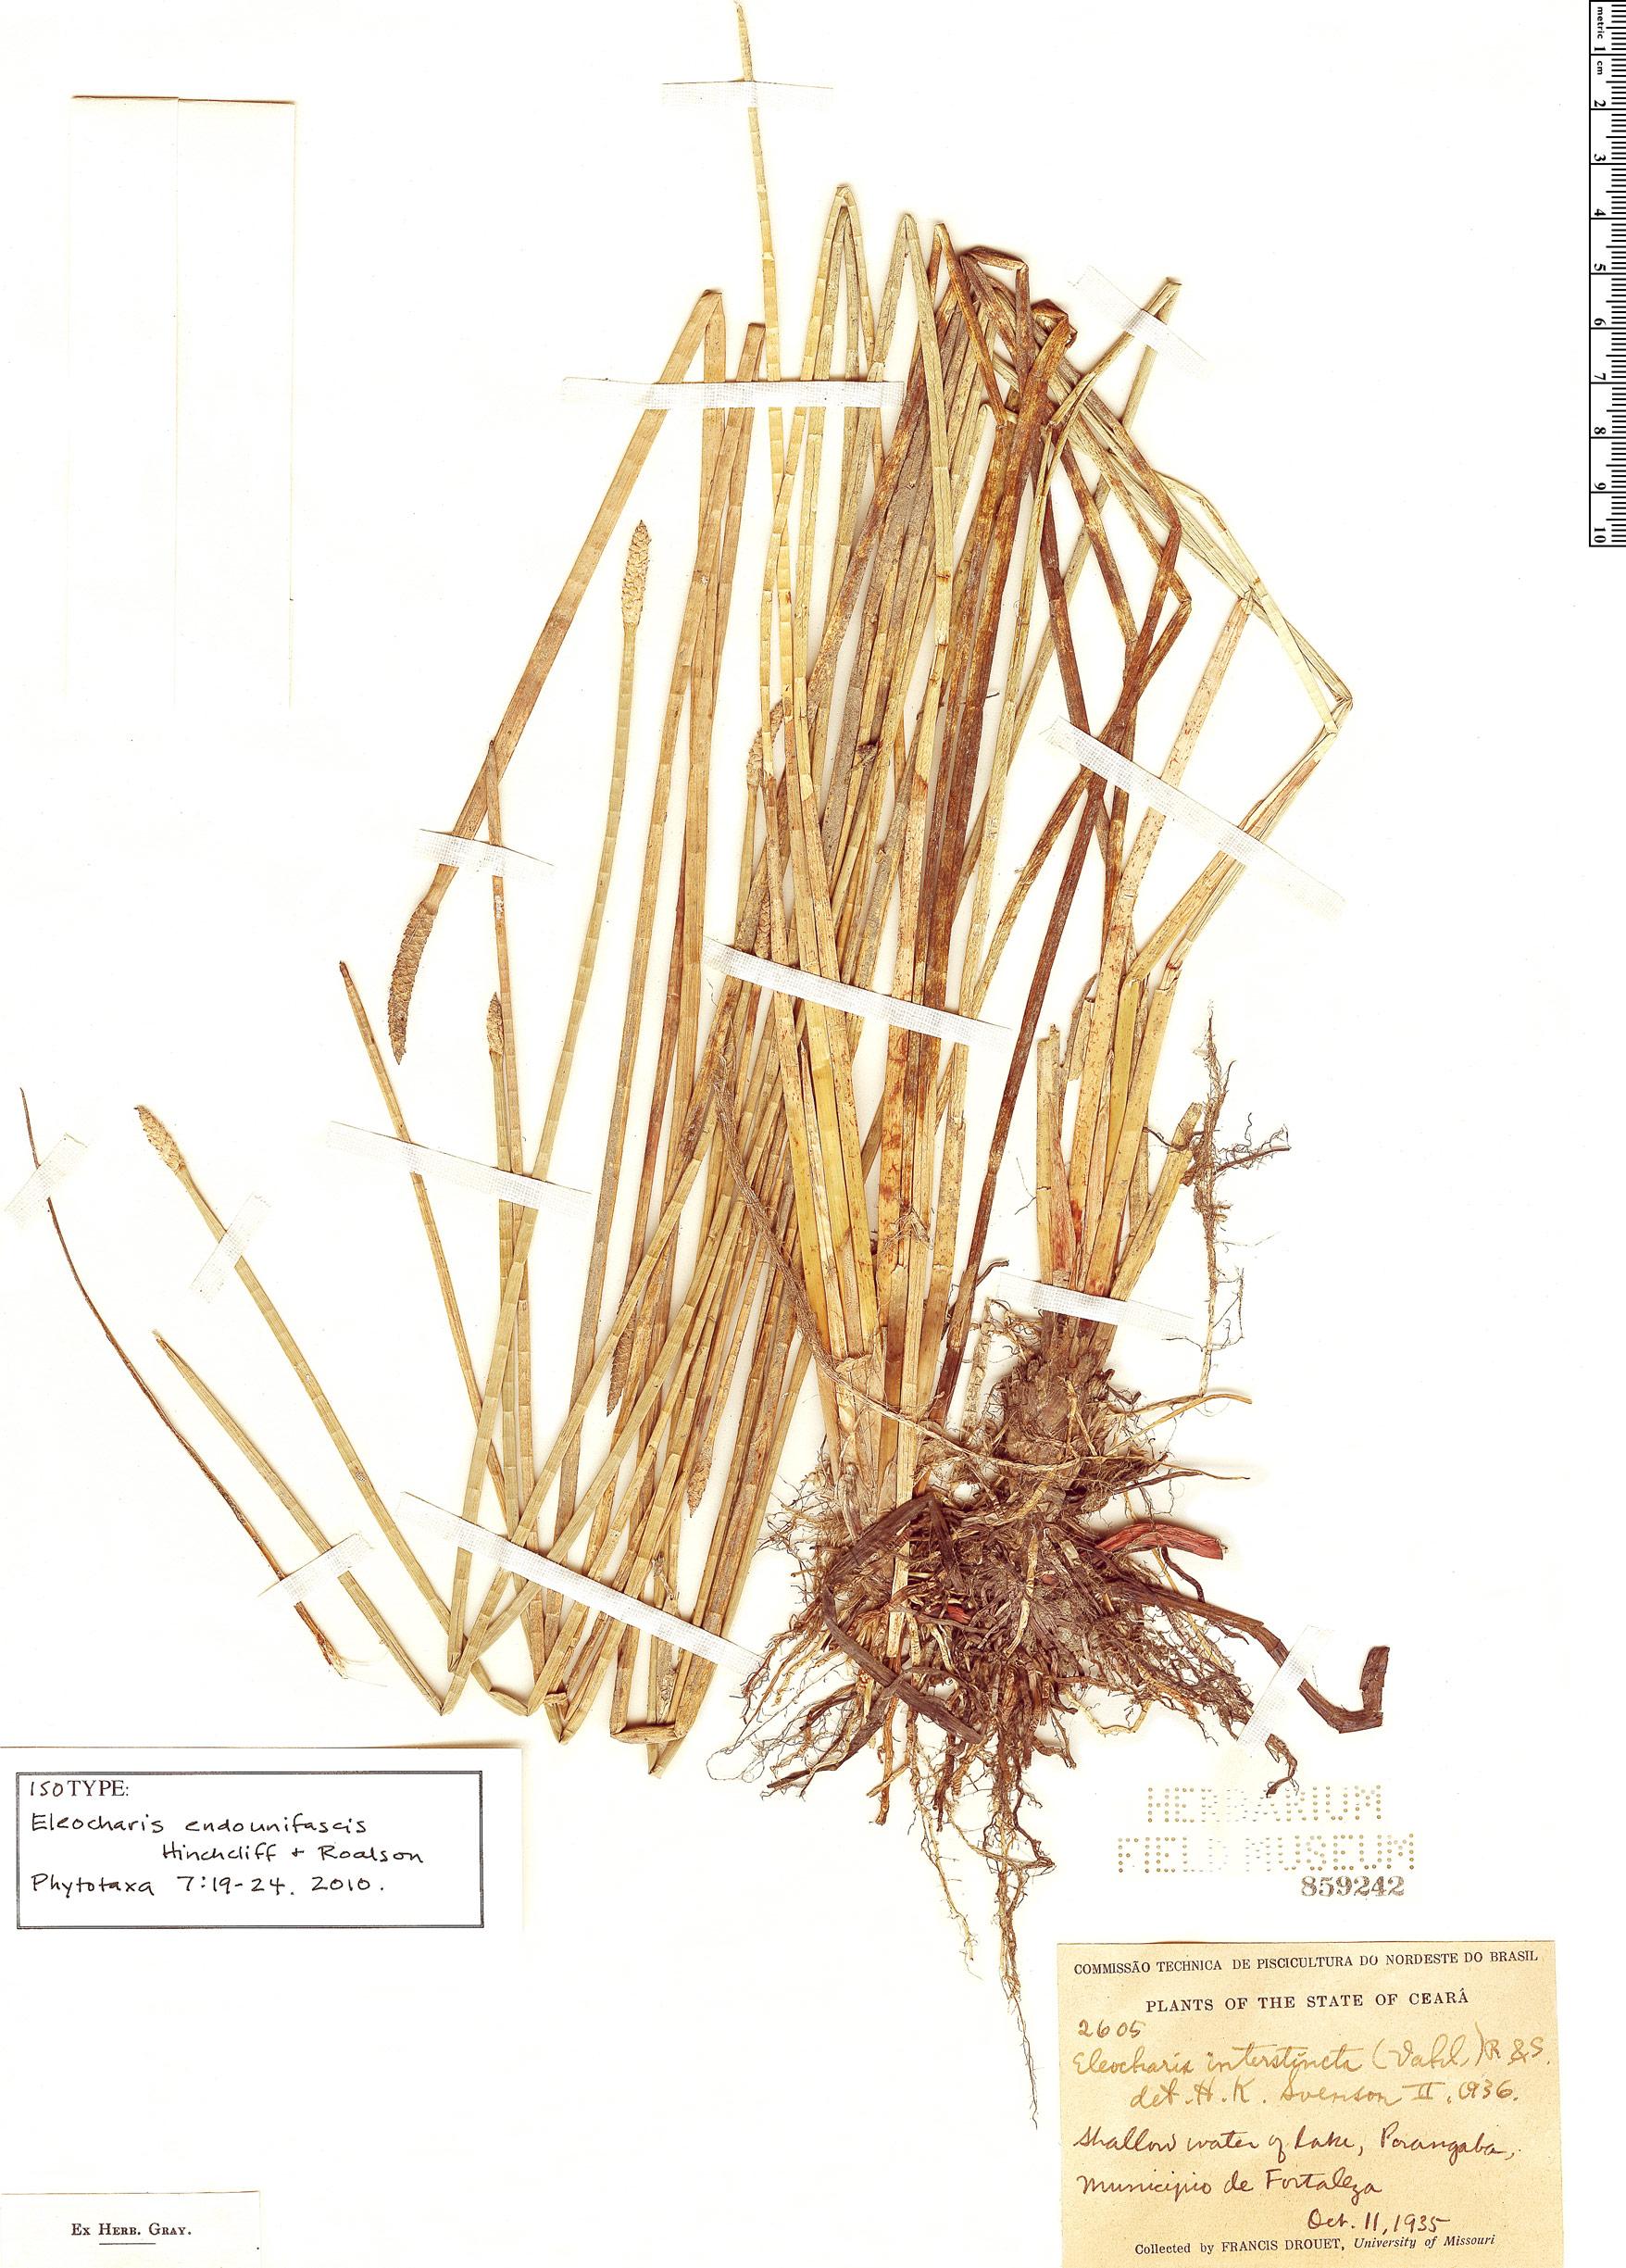 Specimen: Eleocharis endounifascis